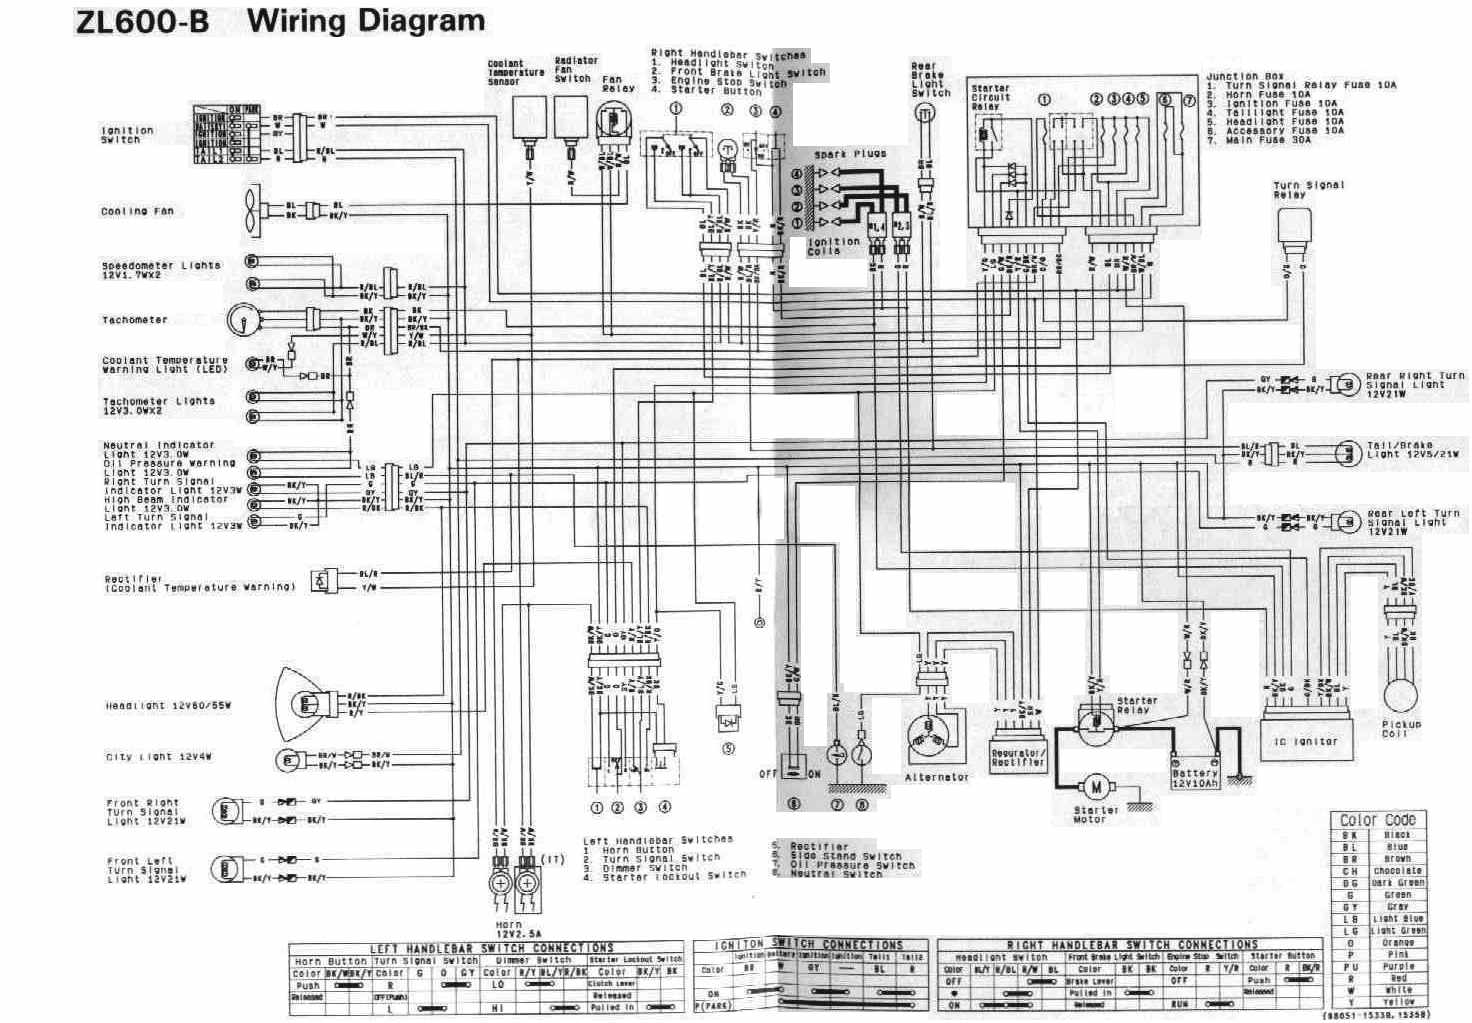 Marvellous Suzuki Dl650 Wiring Diagram Ac Wiring Diagram 1998 Camaro